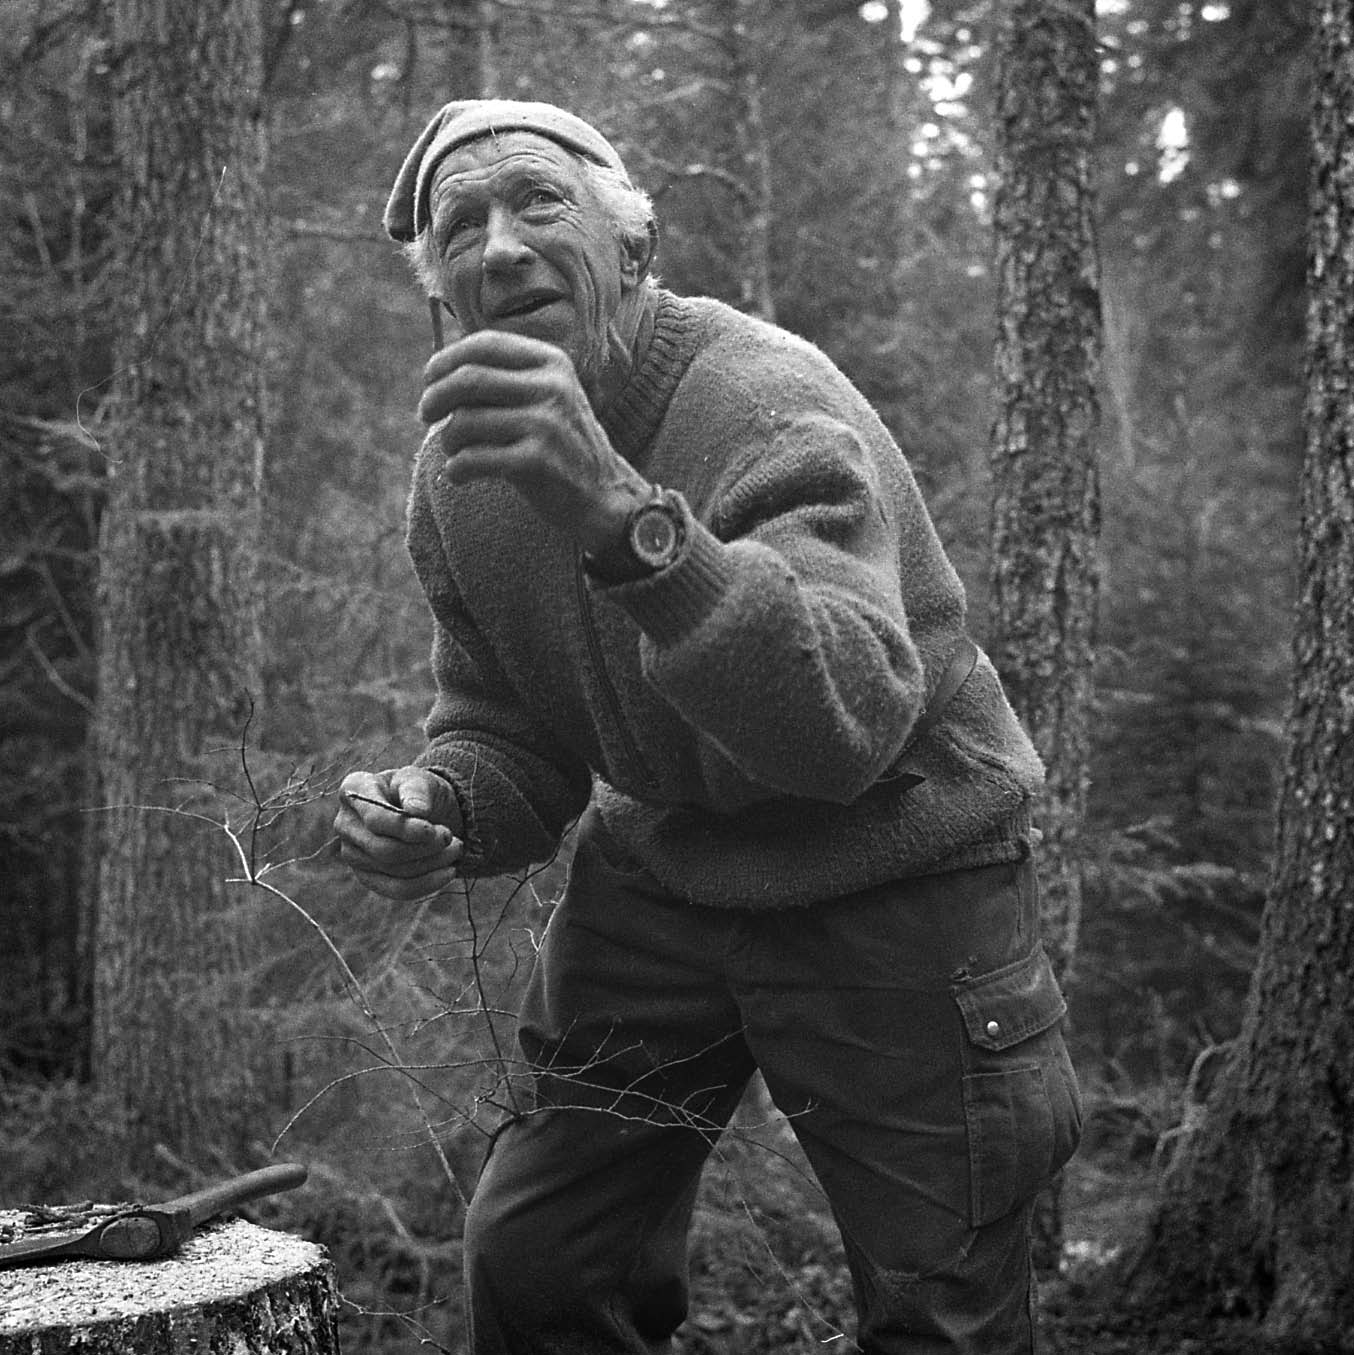 Lorenzo Pellegrini - Cueilleur darbres - photographie de Anne-Lise Vullioud